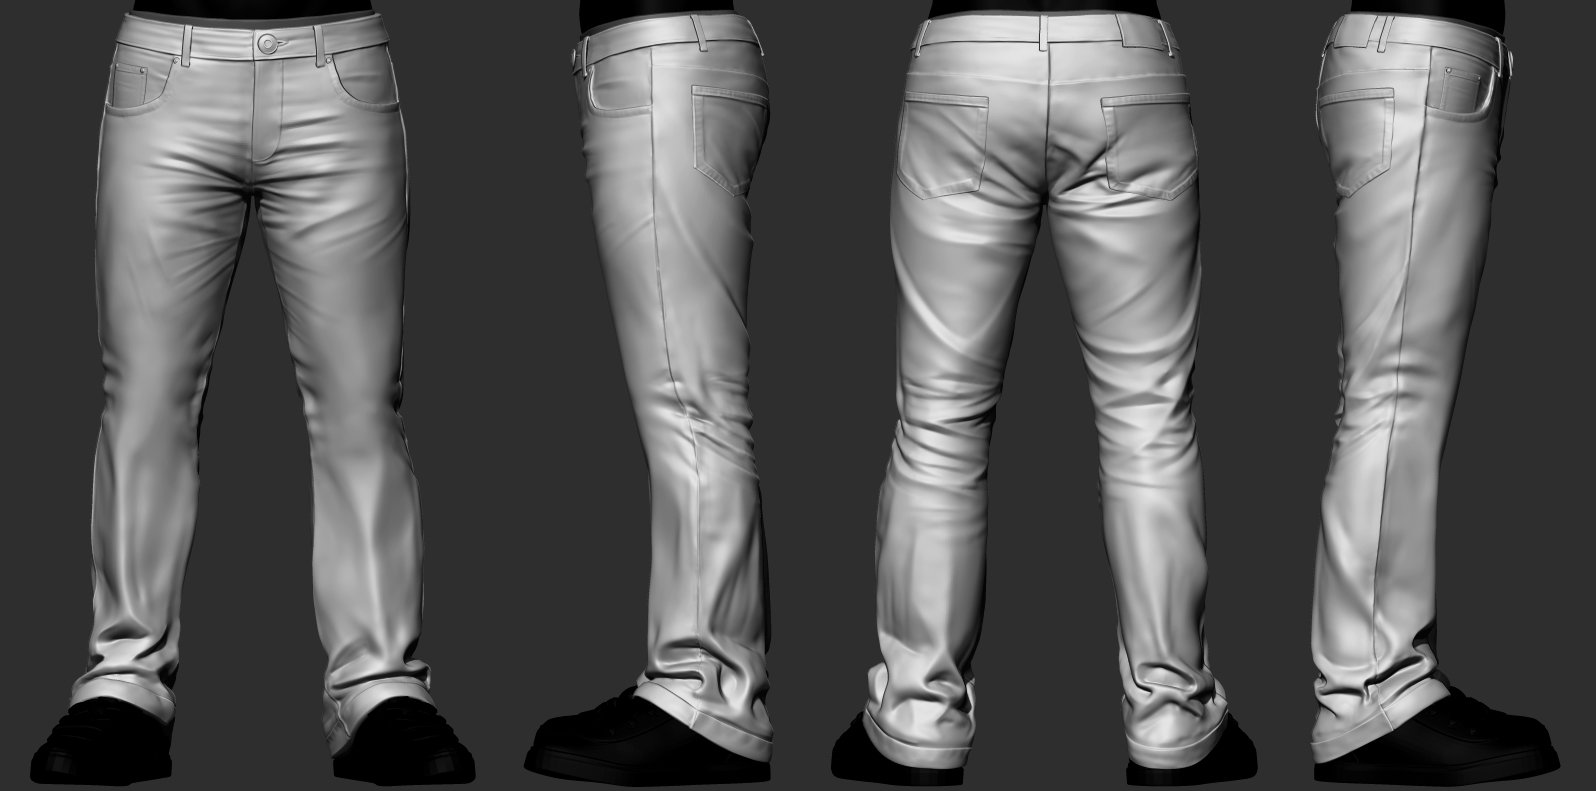 Paul packham study 32 jeans wip 05a